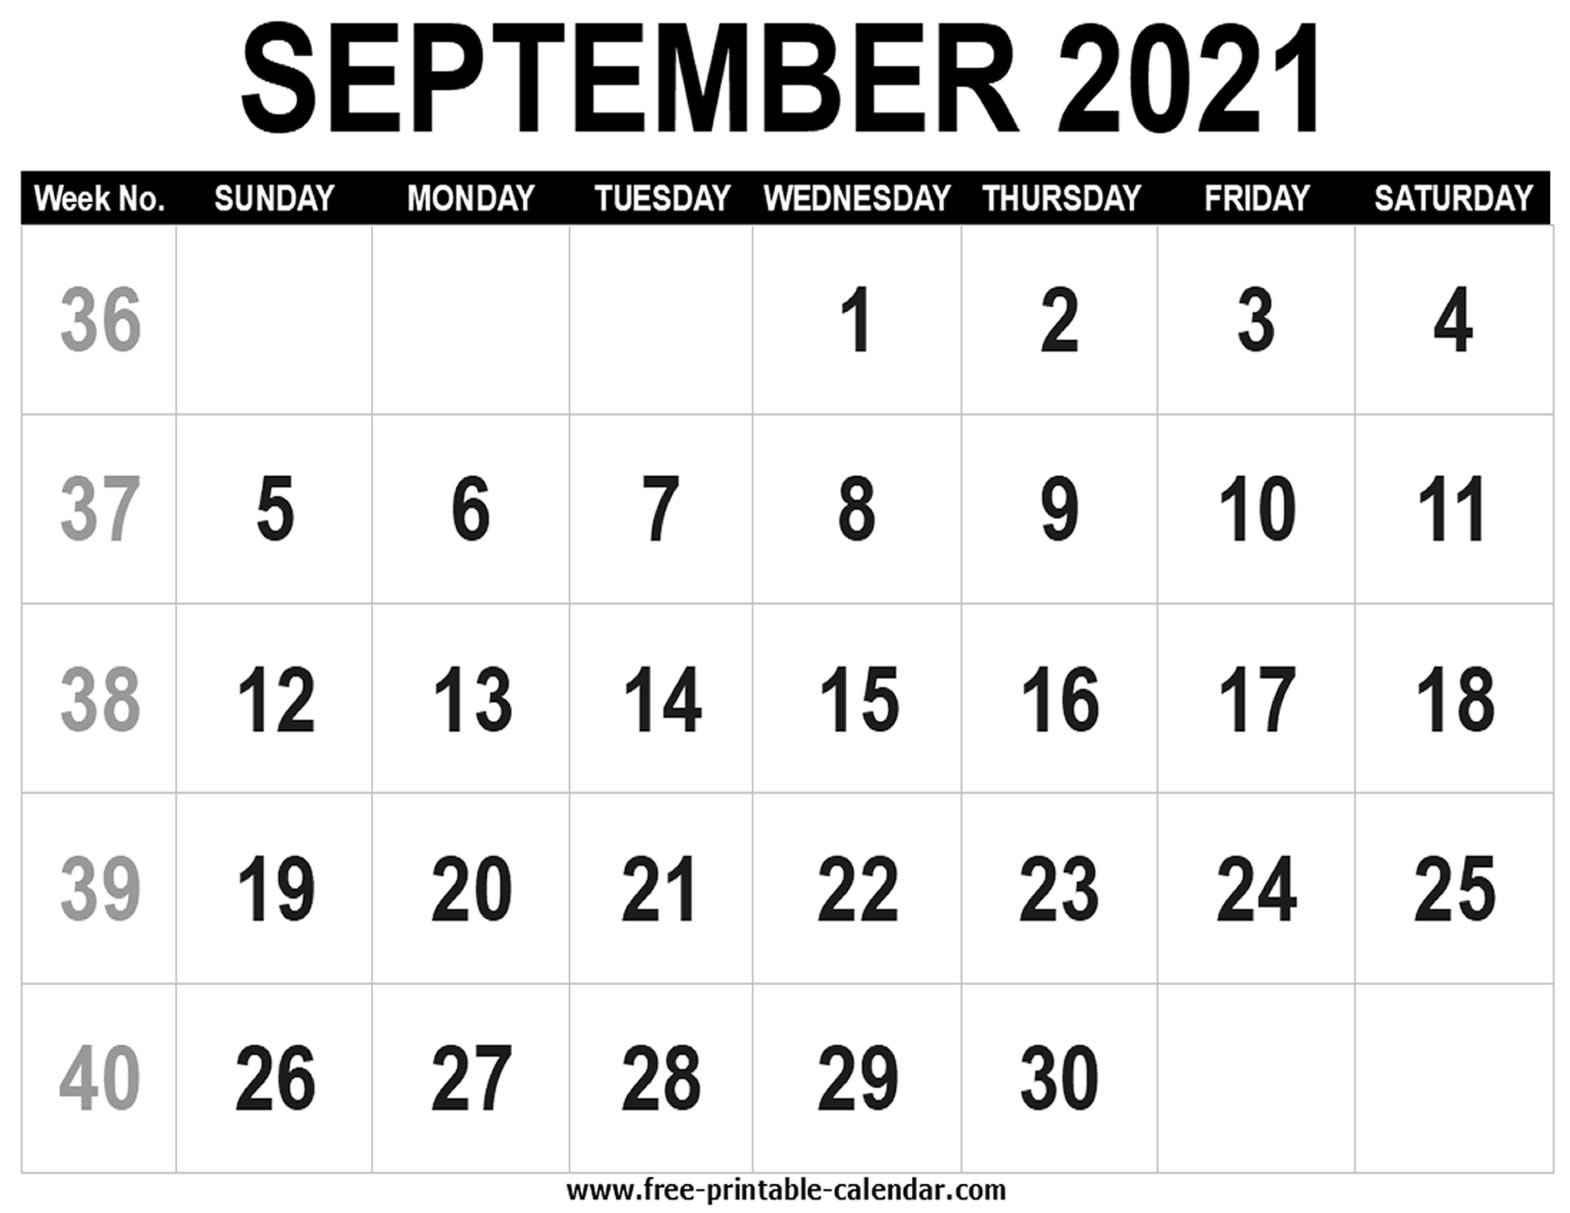 Blank Calendar 2021 September - Free-Printable-Calendar